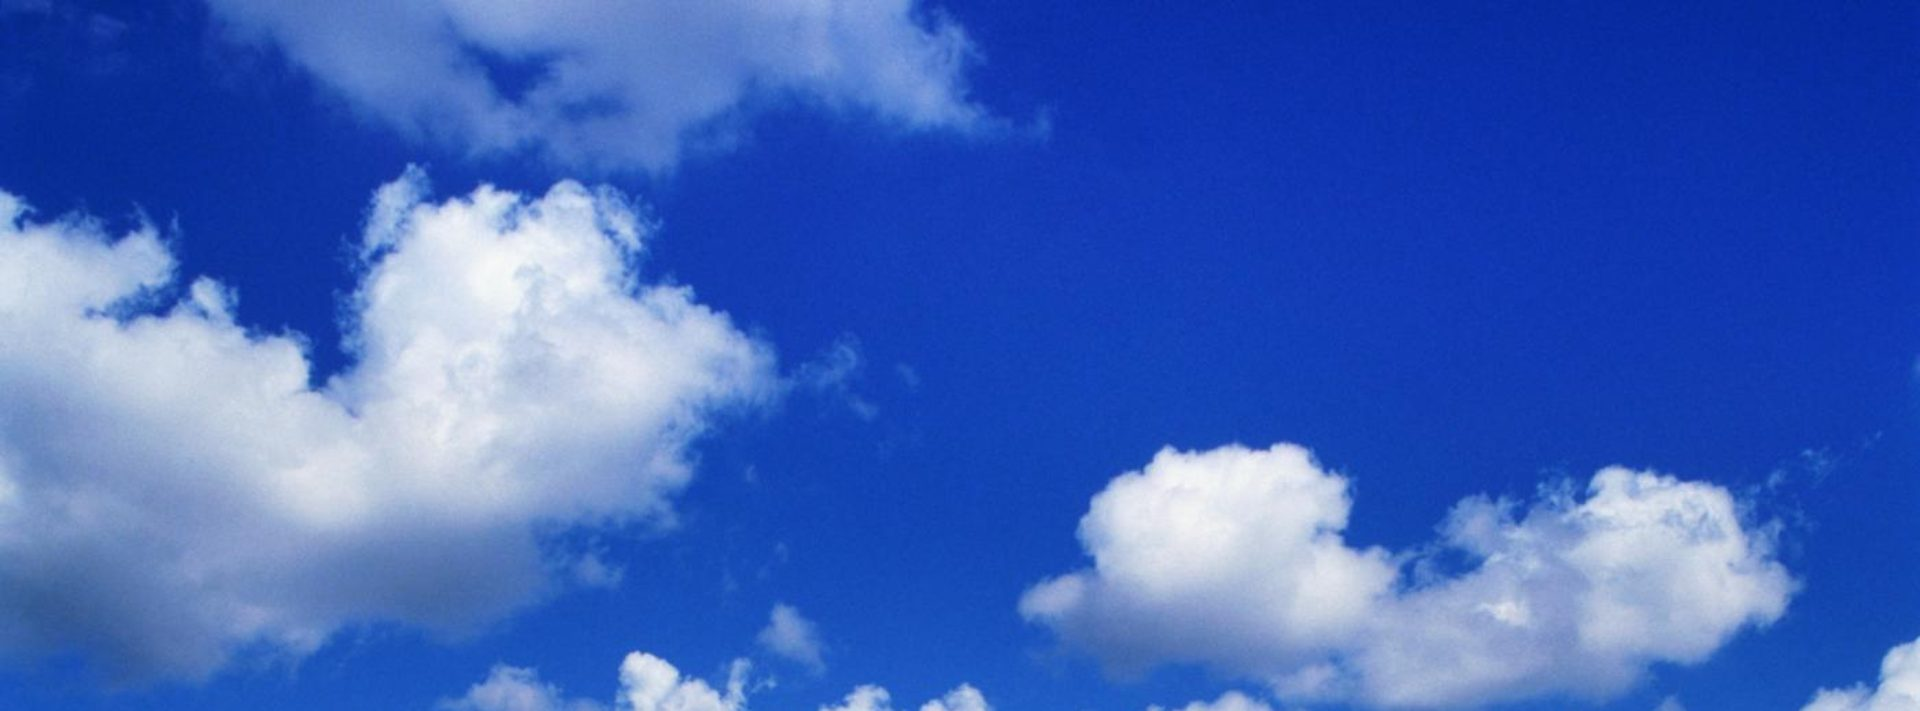 The Blue Sky Group